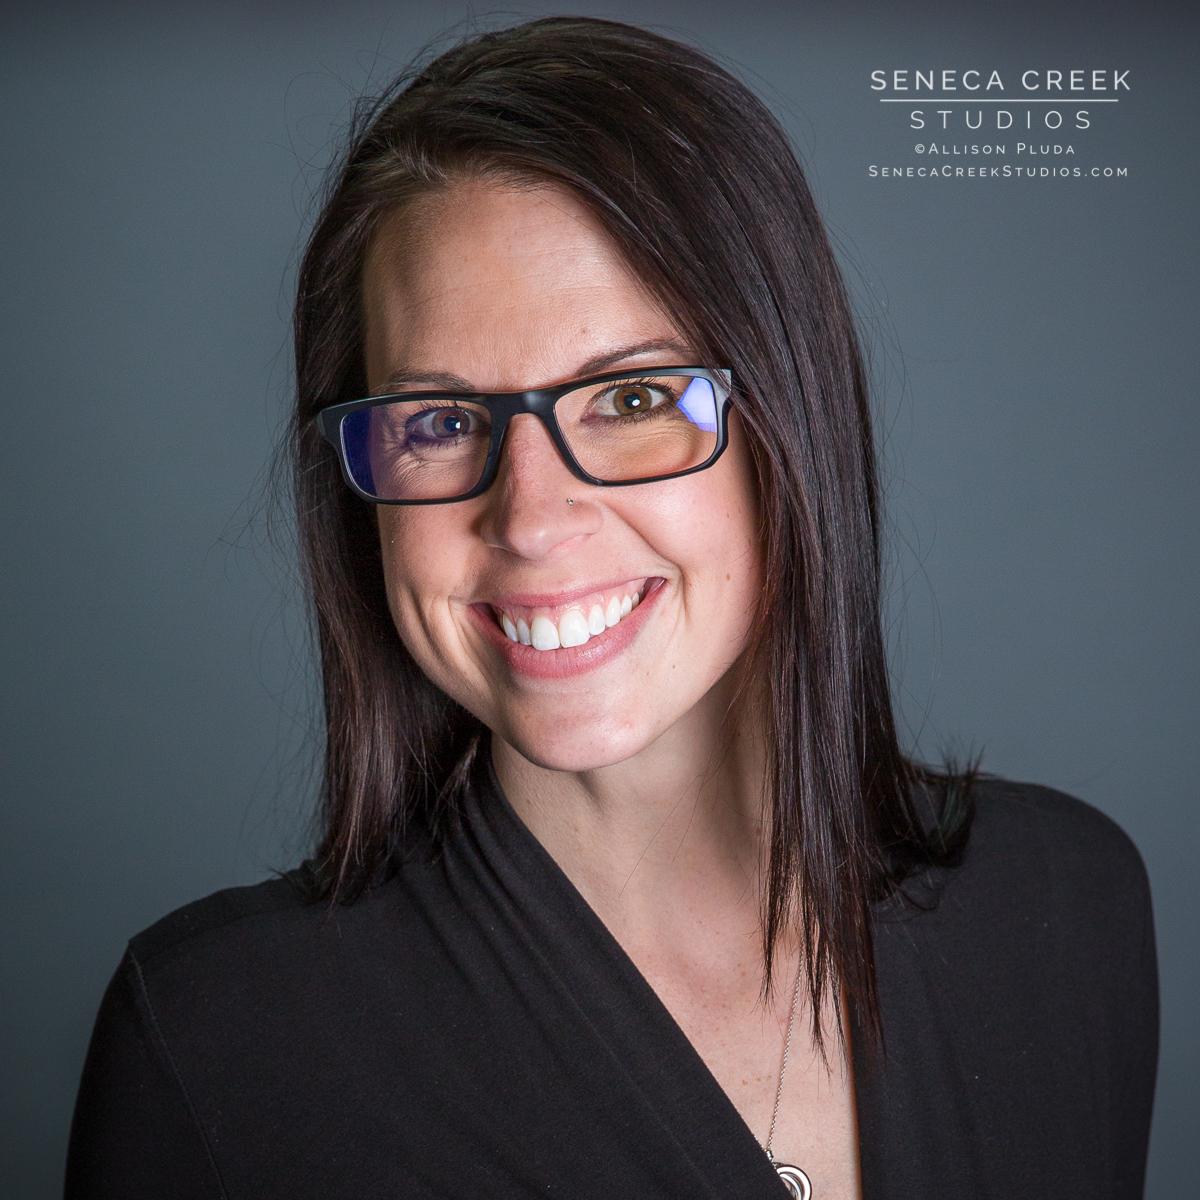 SenecaCreekStudios.com by Allison Pluda | Personal Branding Session and Headshot Portrait with Beth Young Jones in the Studio